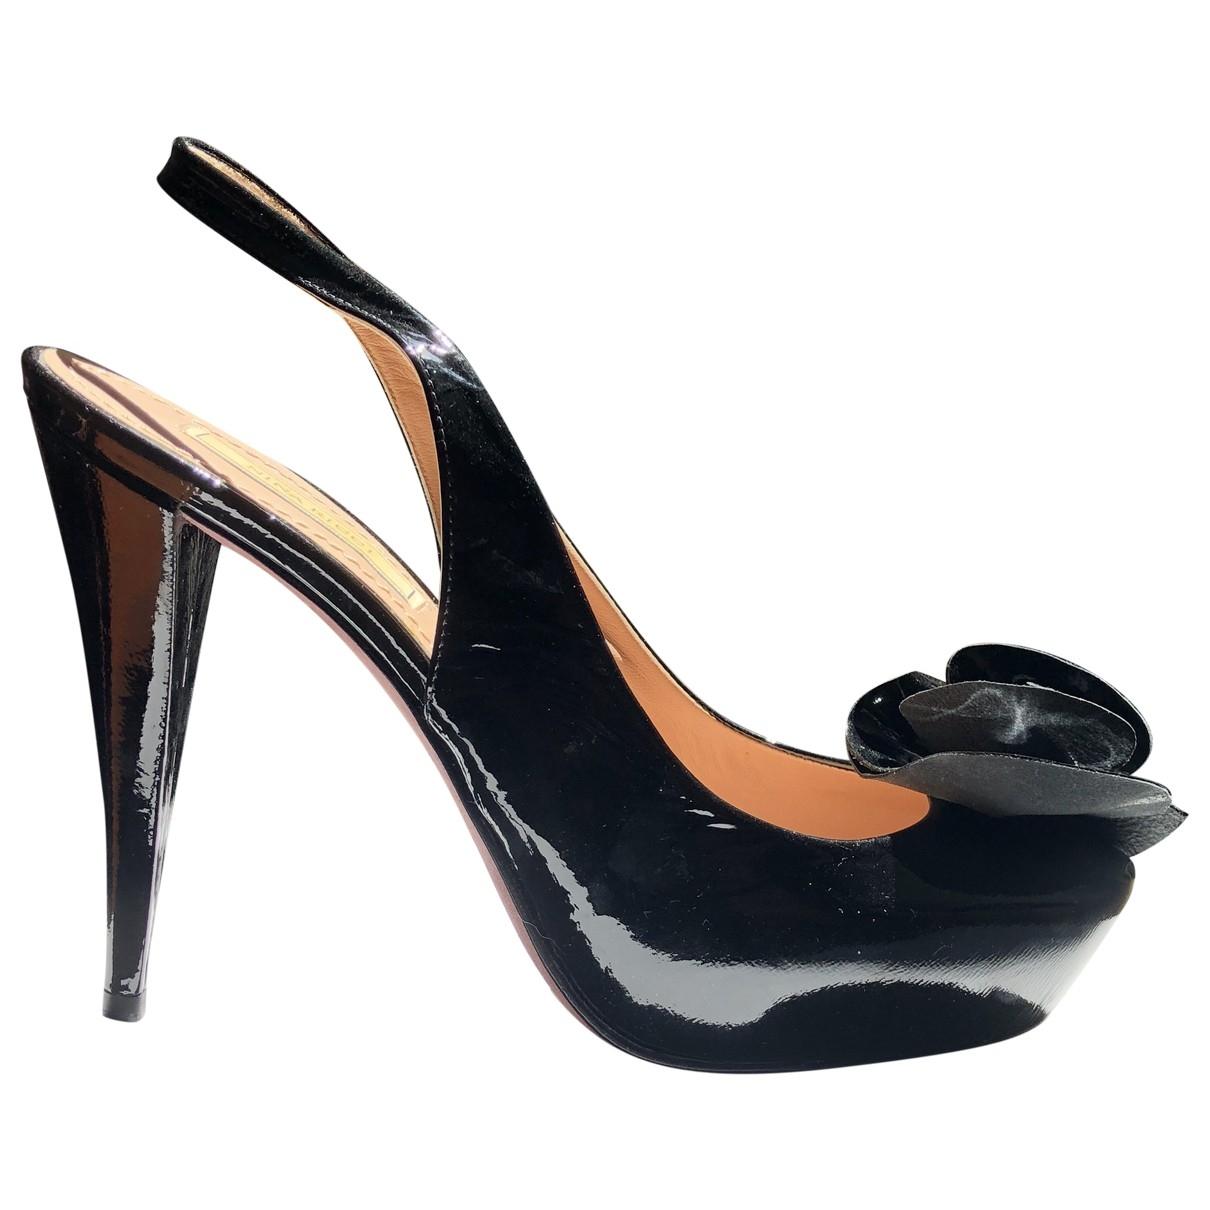 Nina Ricci \N Black Patent leather Heels for Women 39 EU